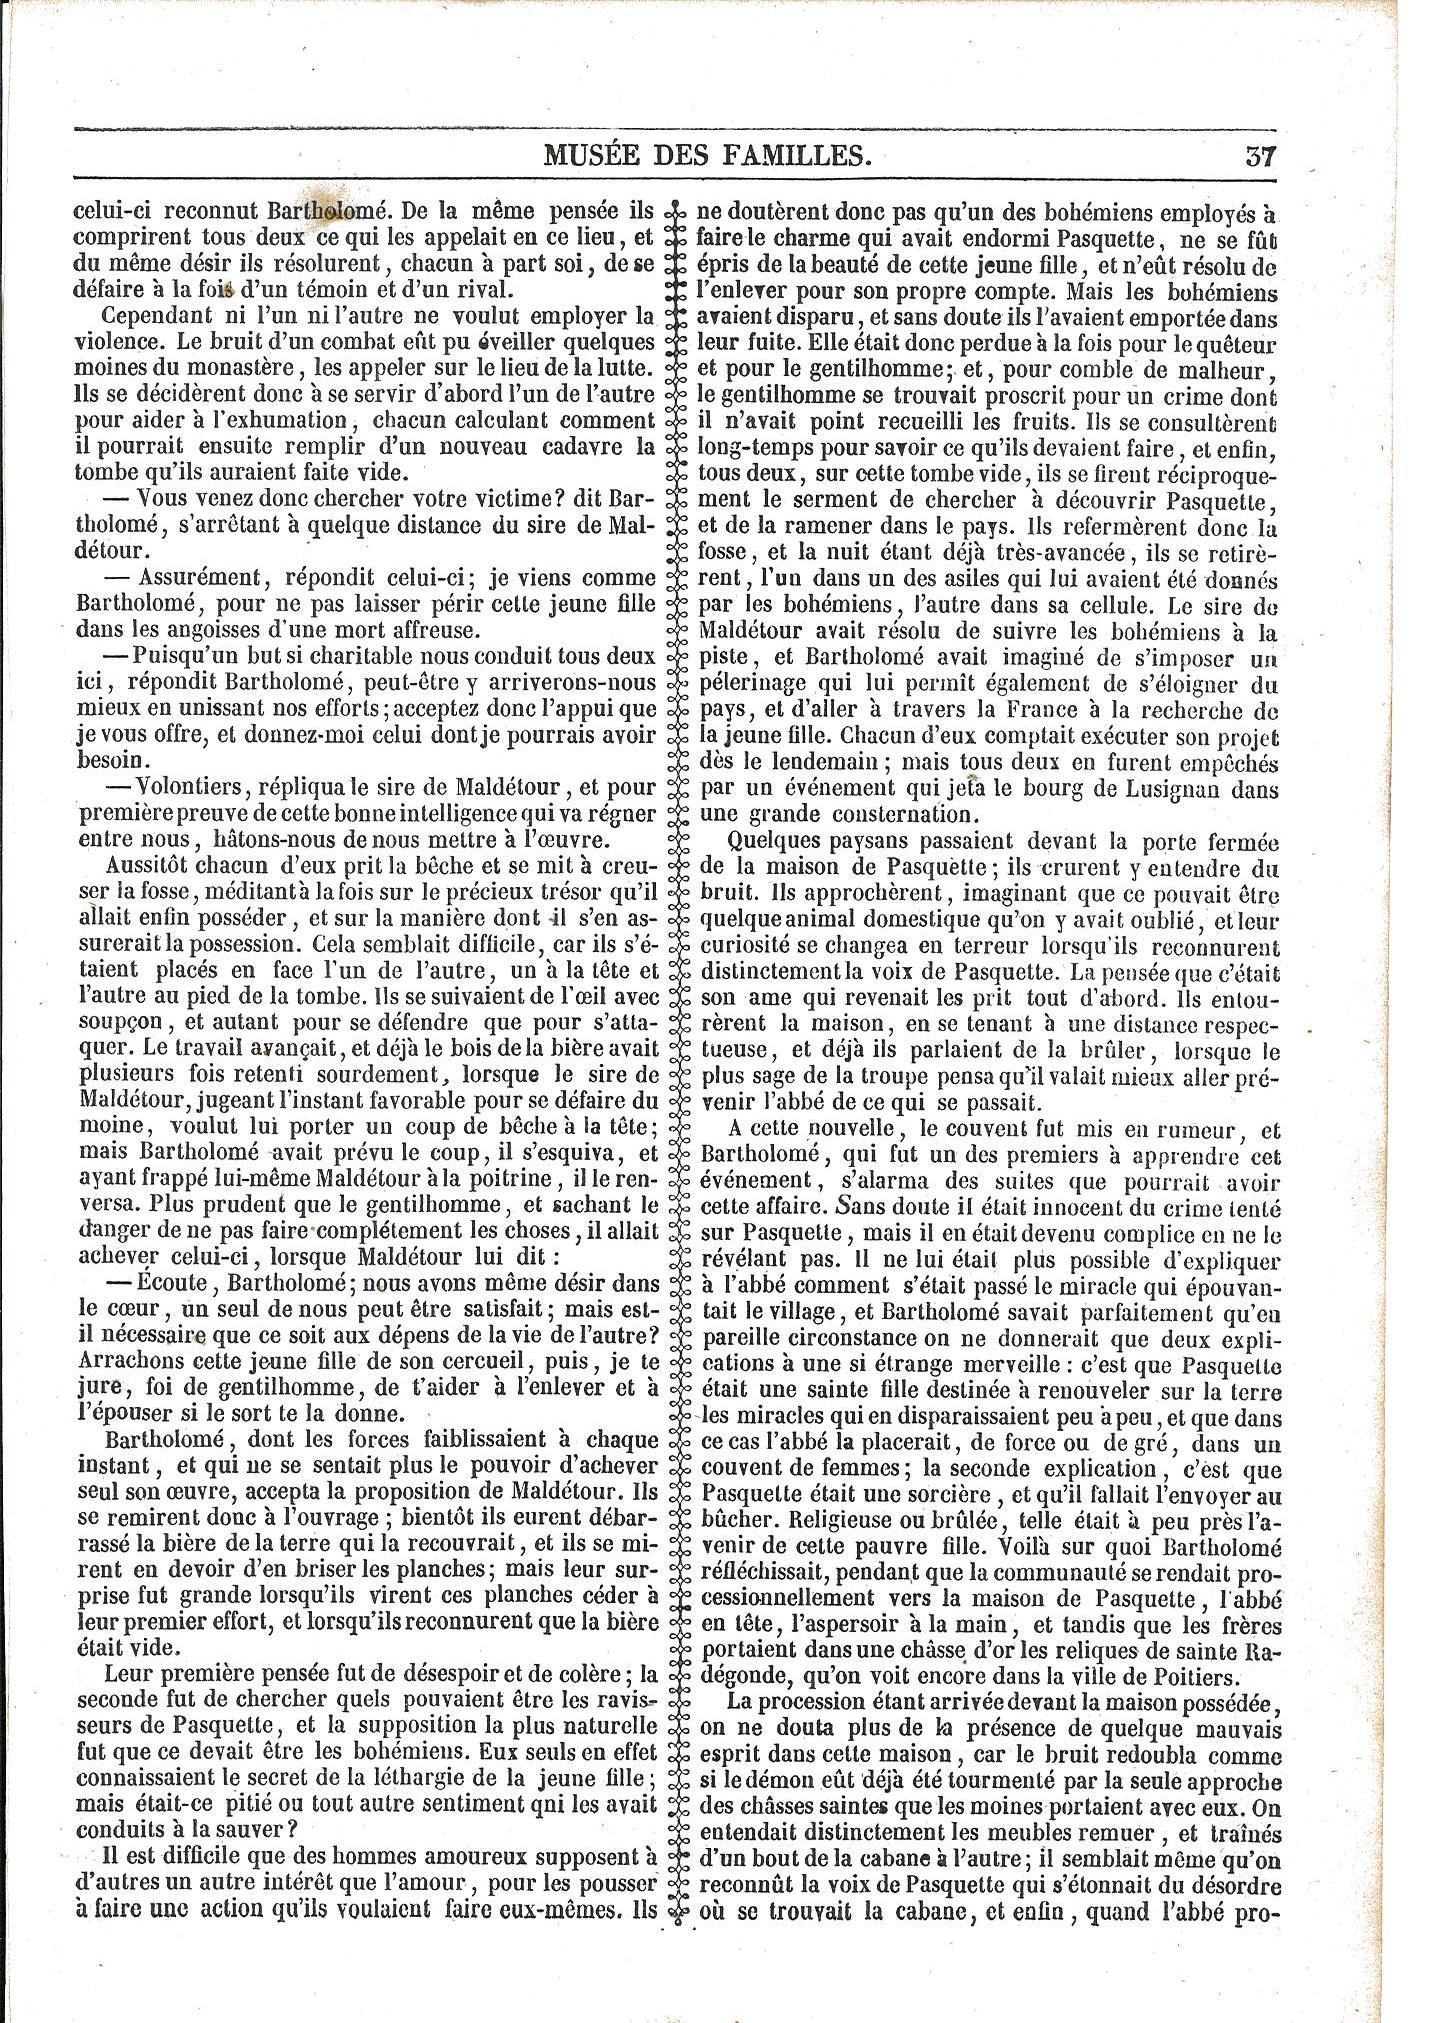 p.37.jpg - image/jpeg